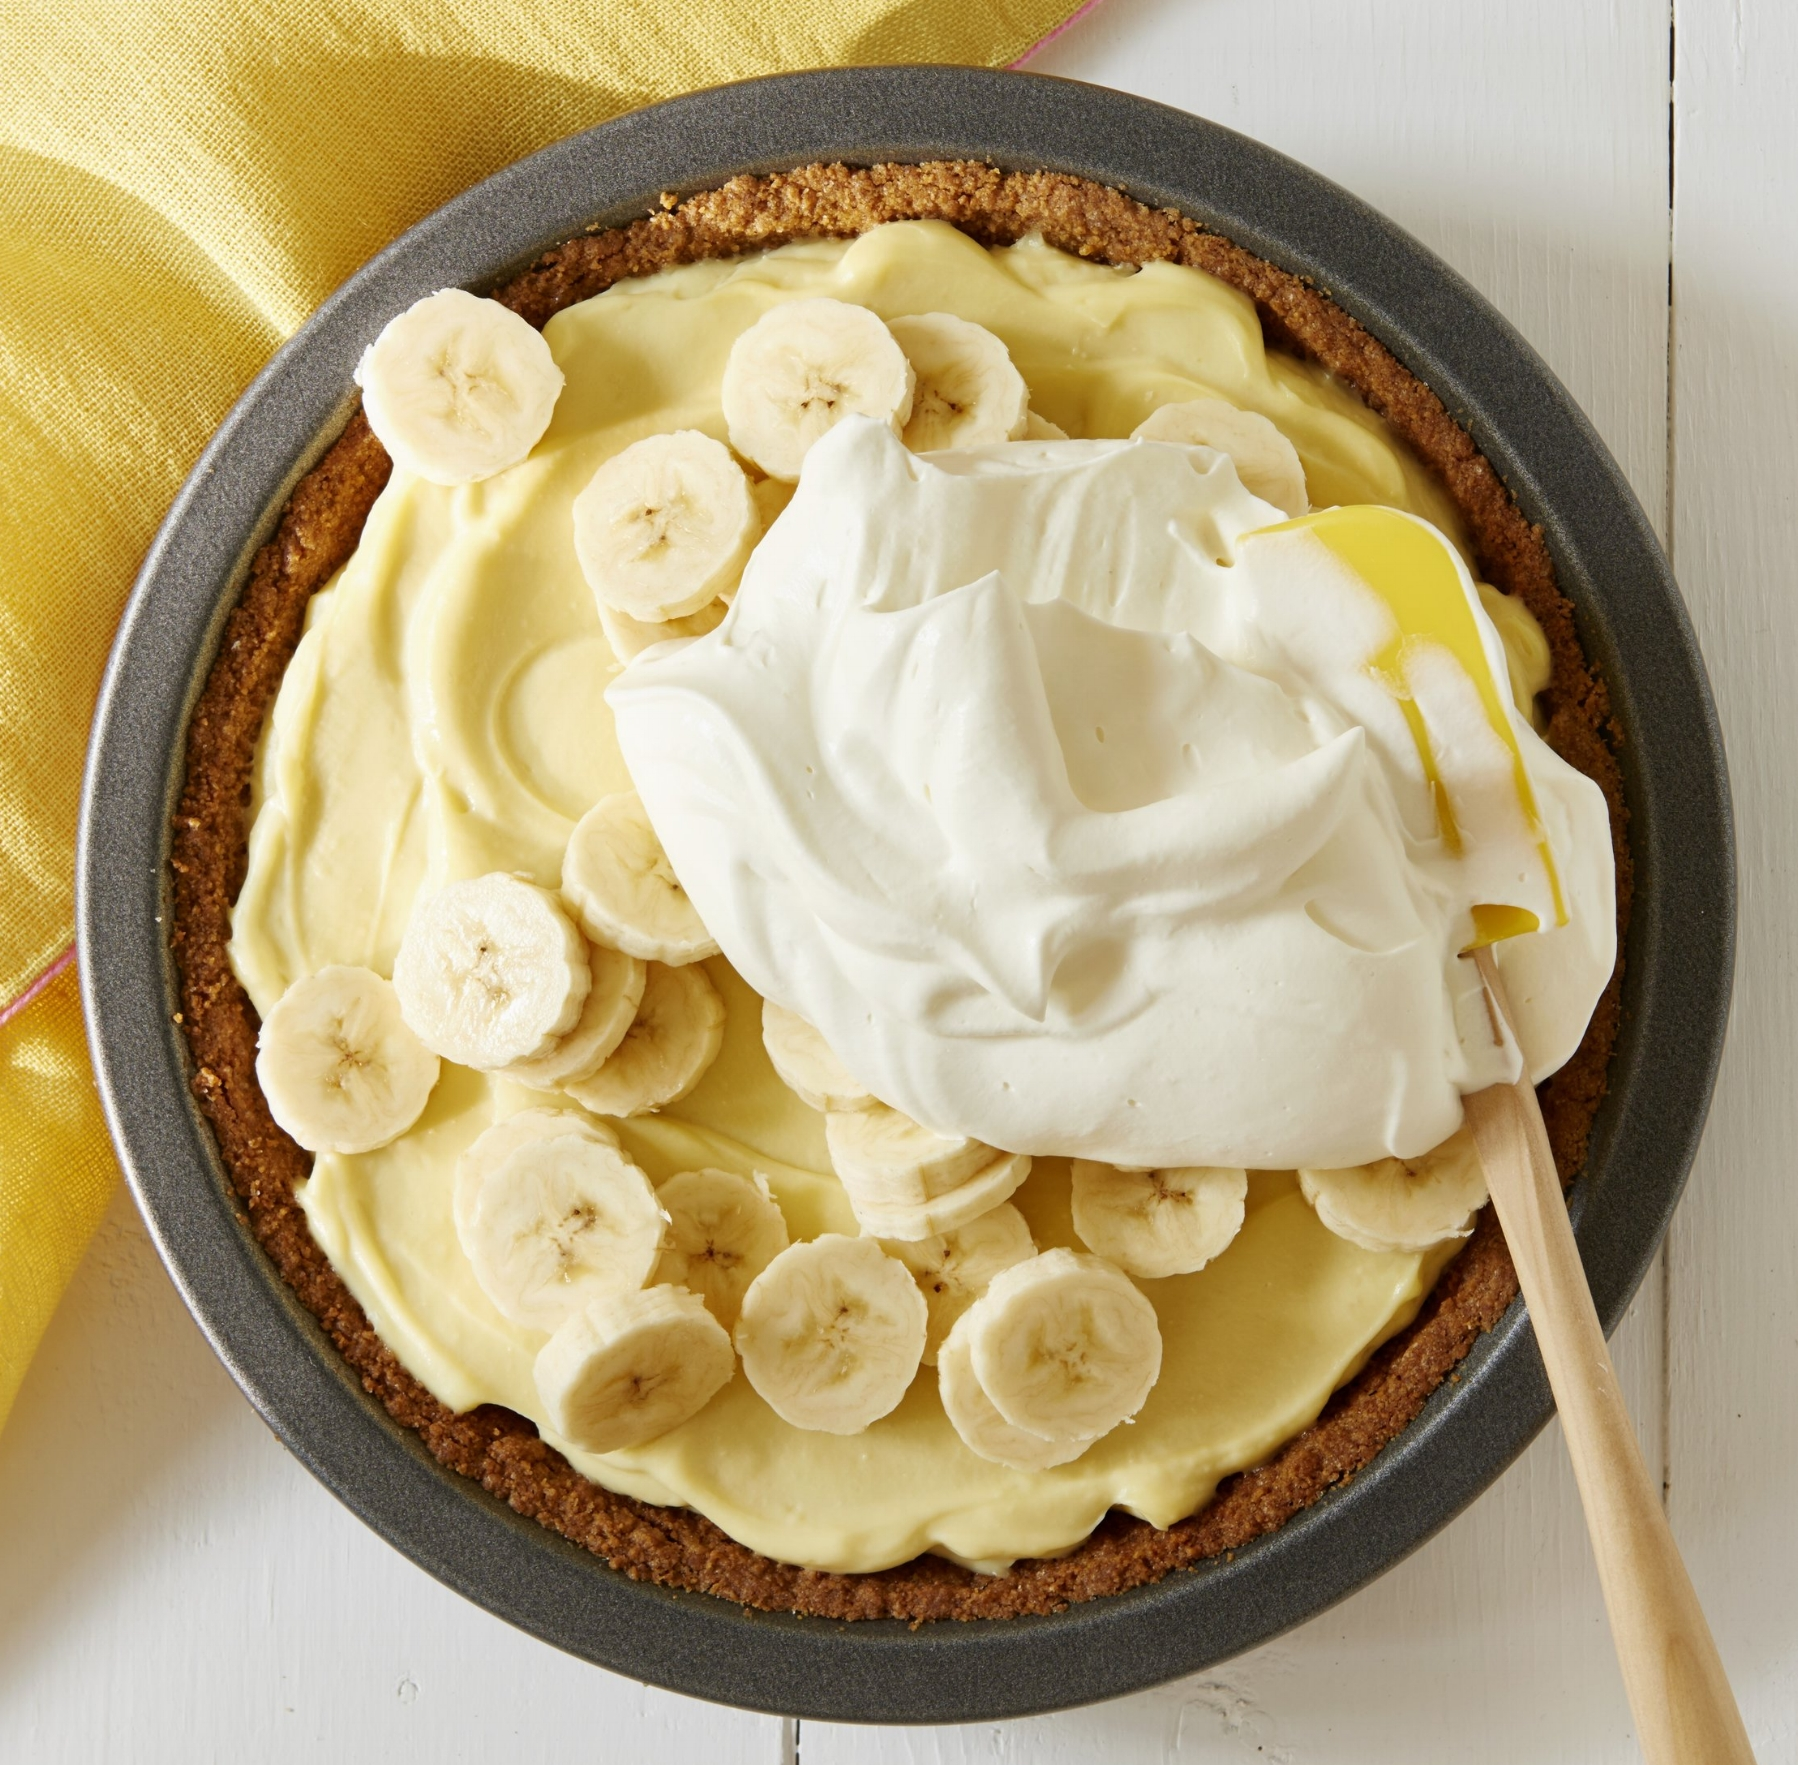 sprnkls_banana_crm_pie-0636_retouched copy.jpg